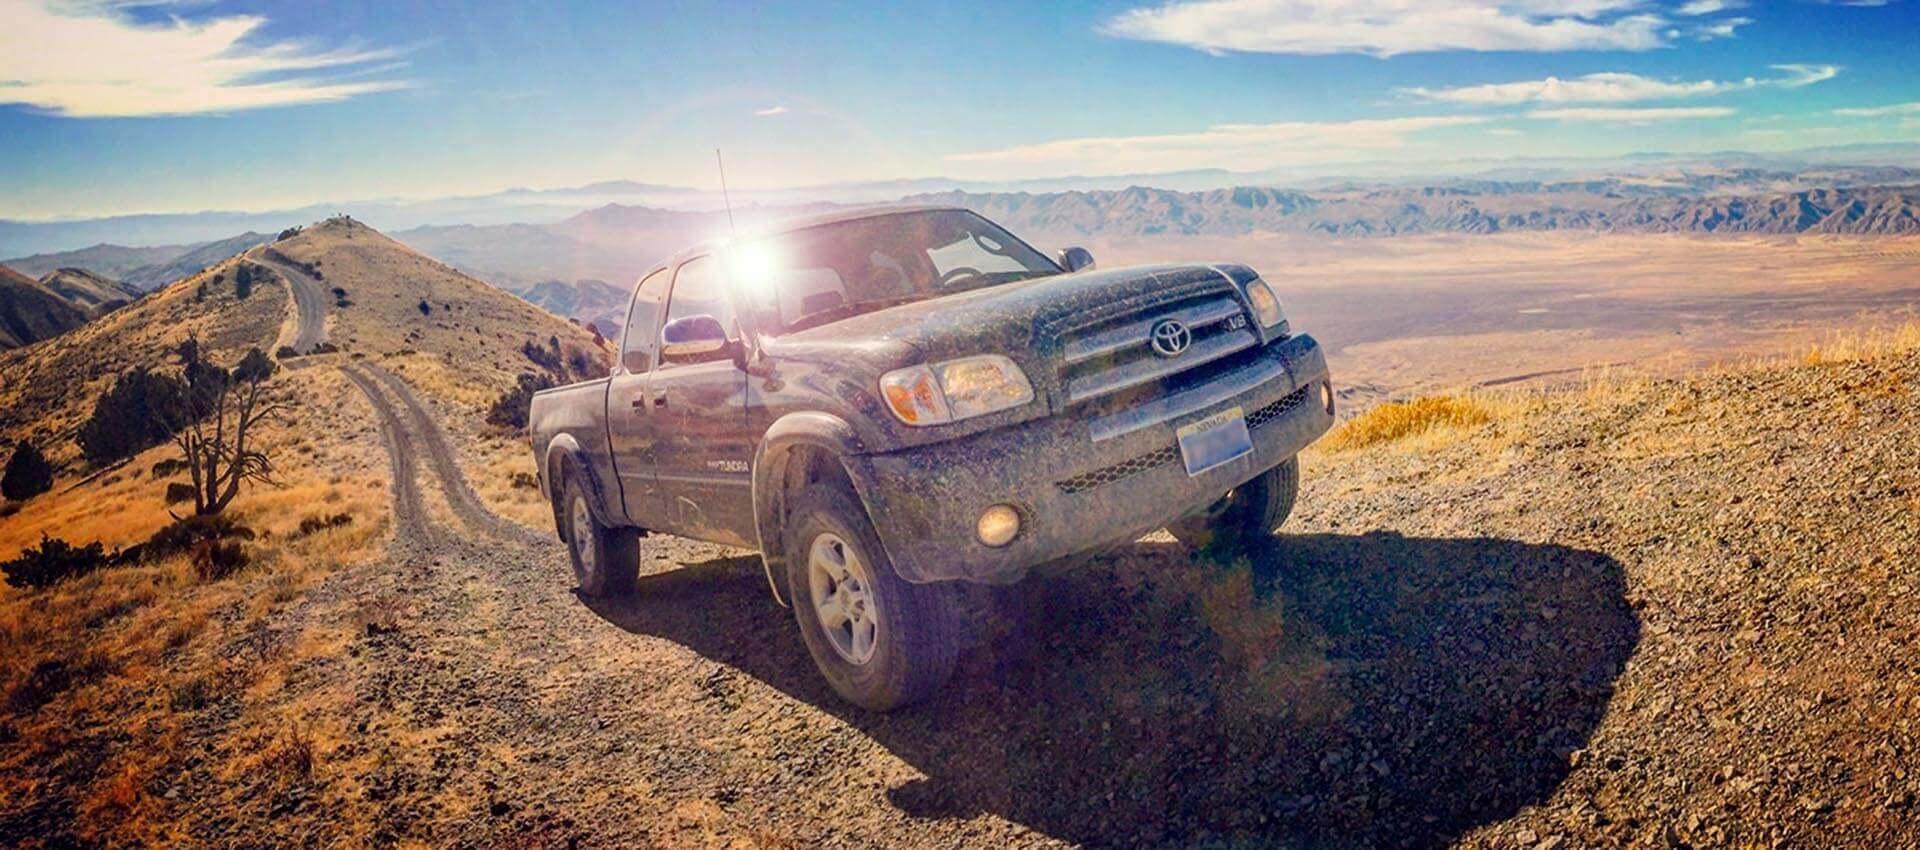 Off Roading, Off-Roading, Nevada Off Road, Off Road Nevada